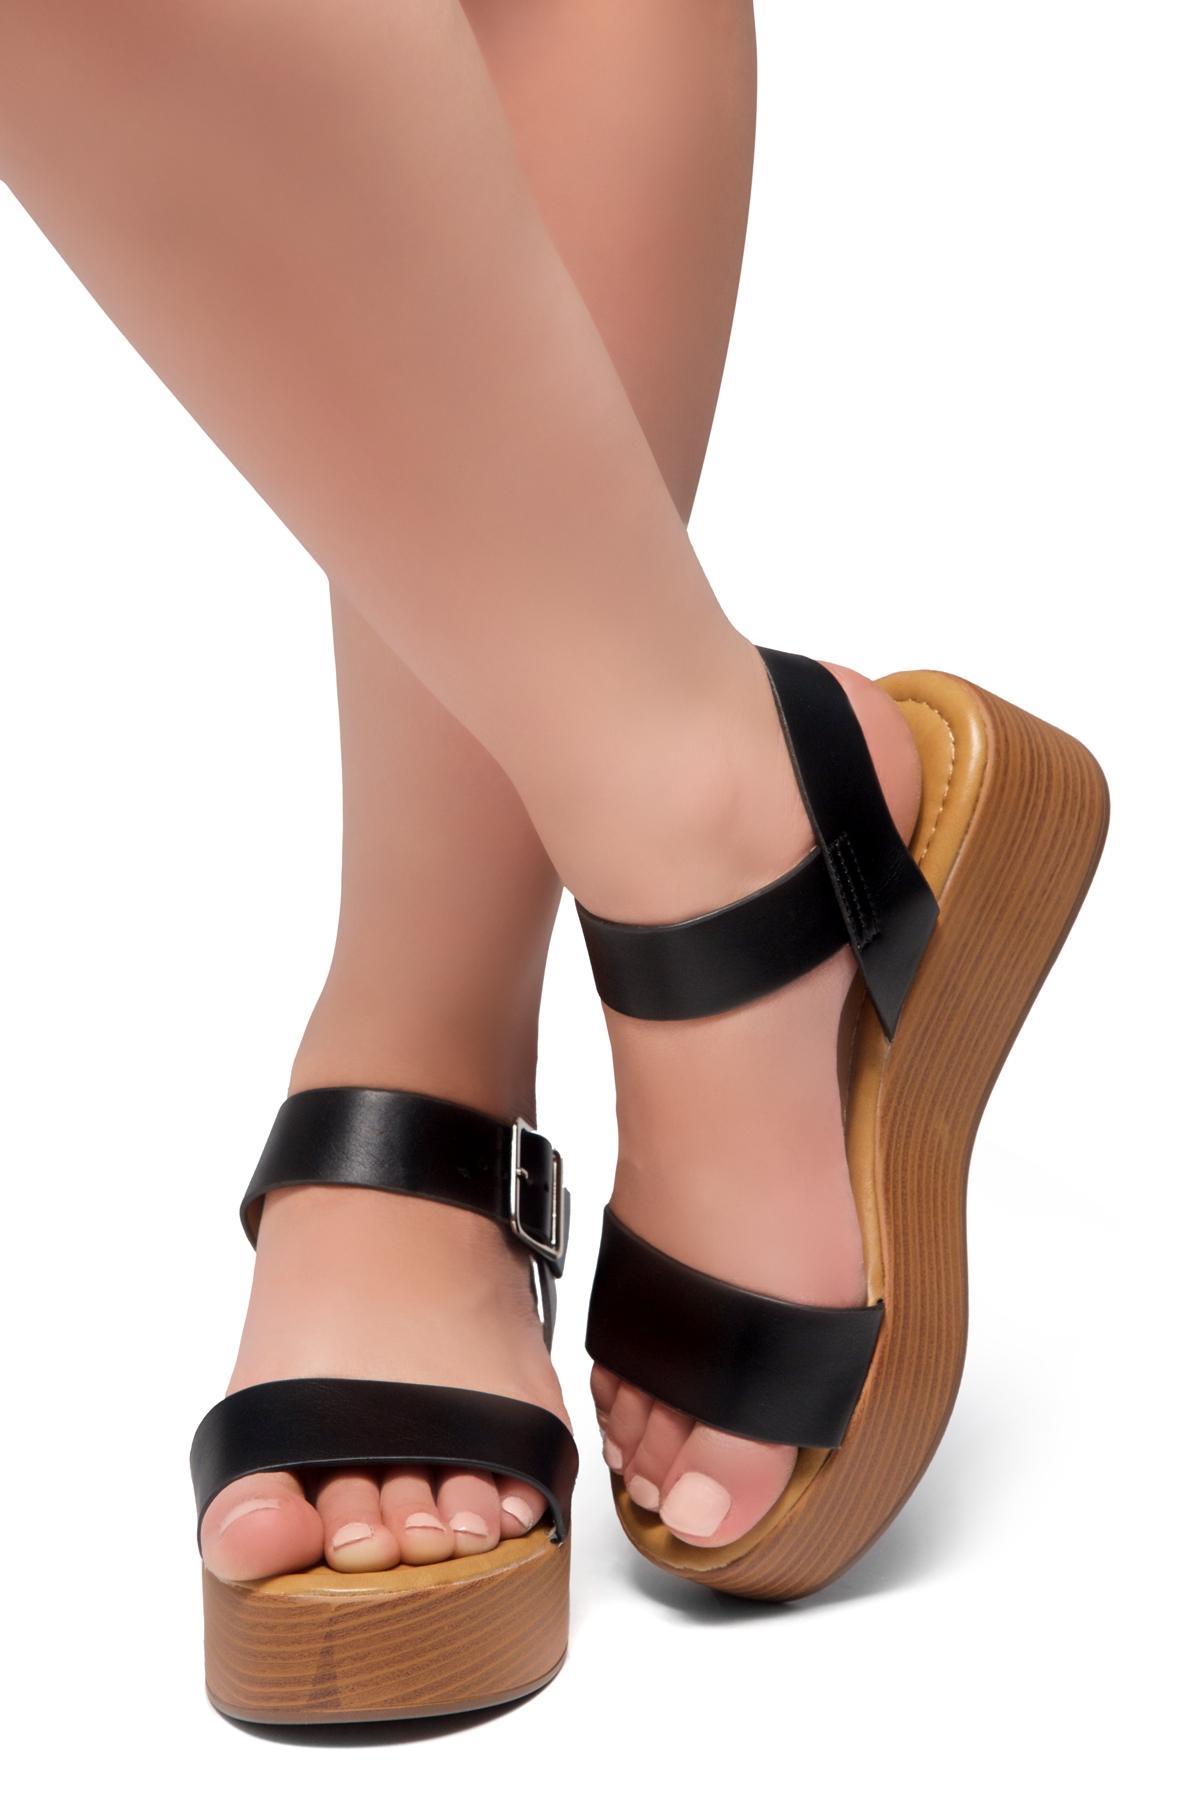 Ankle Carita Strap Herstyle Platform Open Wedgeblackwood Toe eDH9WY2IE